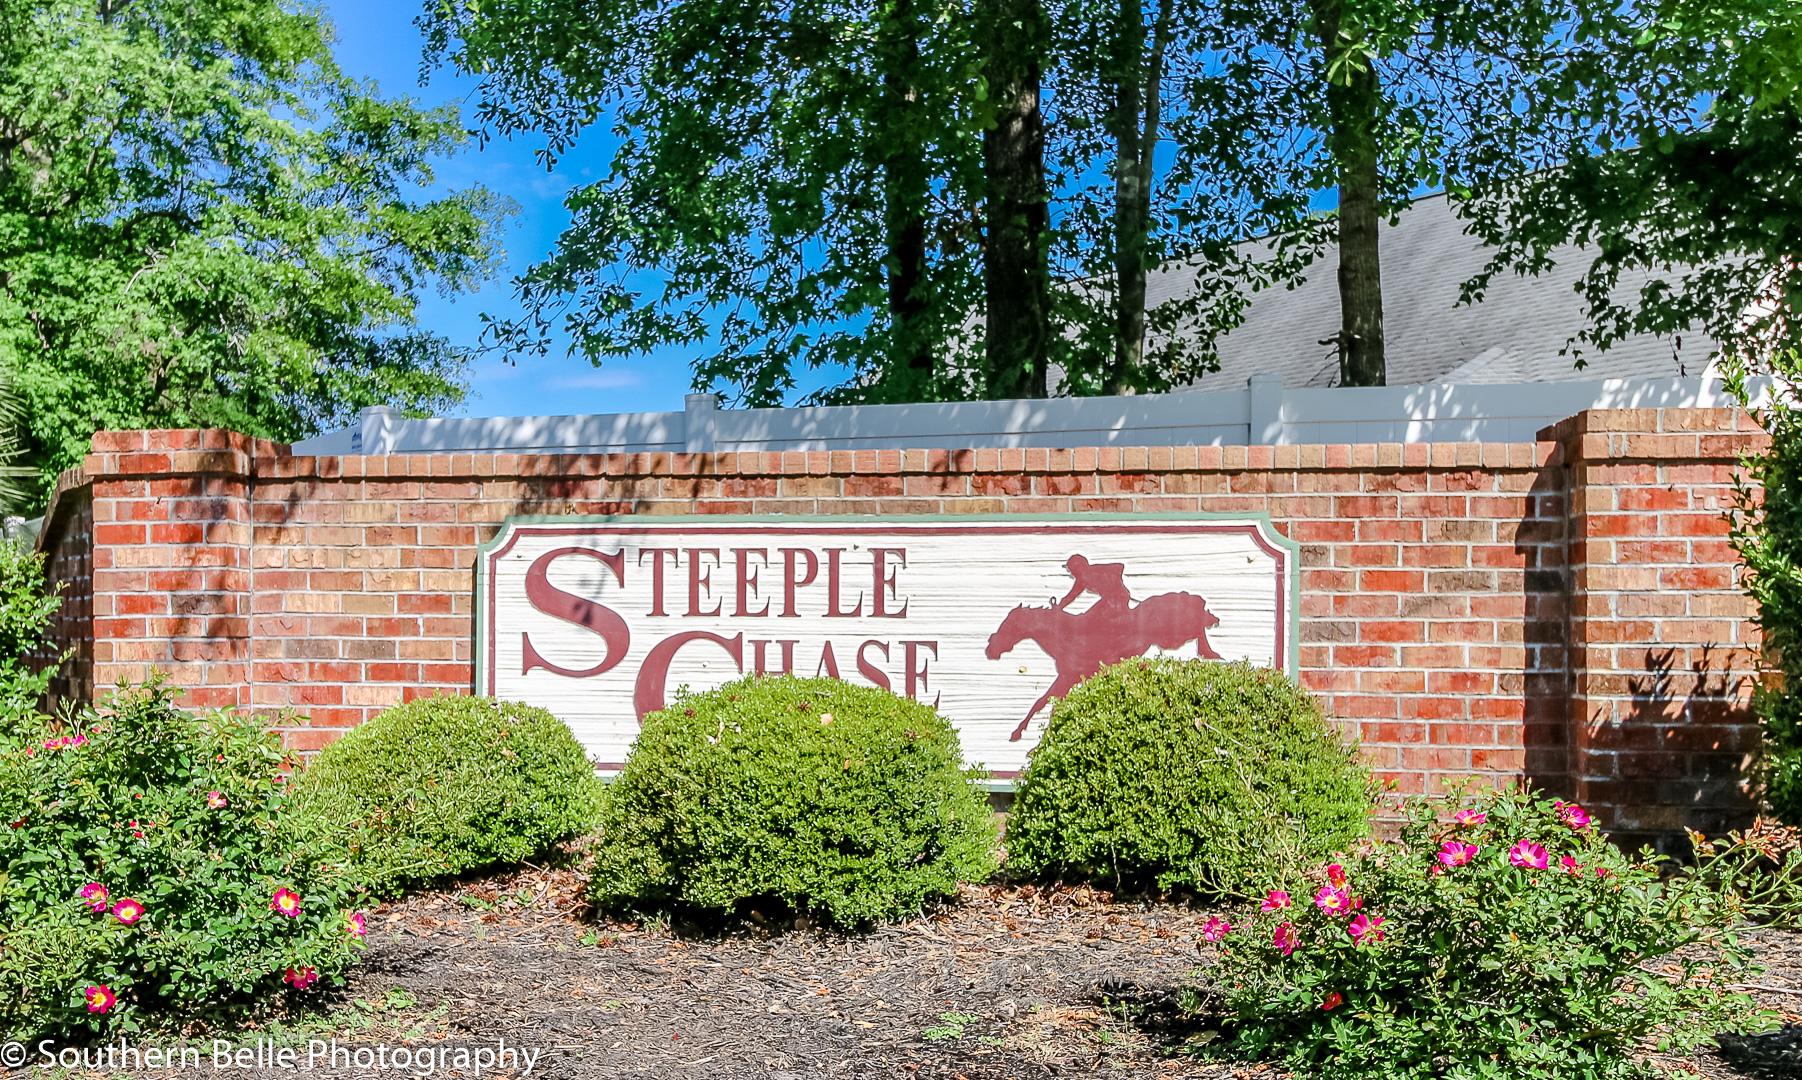 1. Steeple Chase Entrance WM